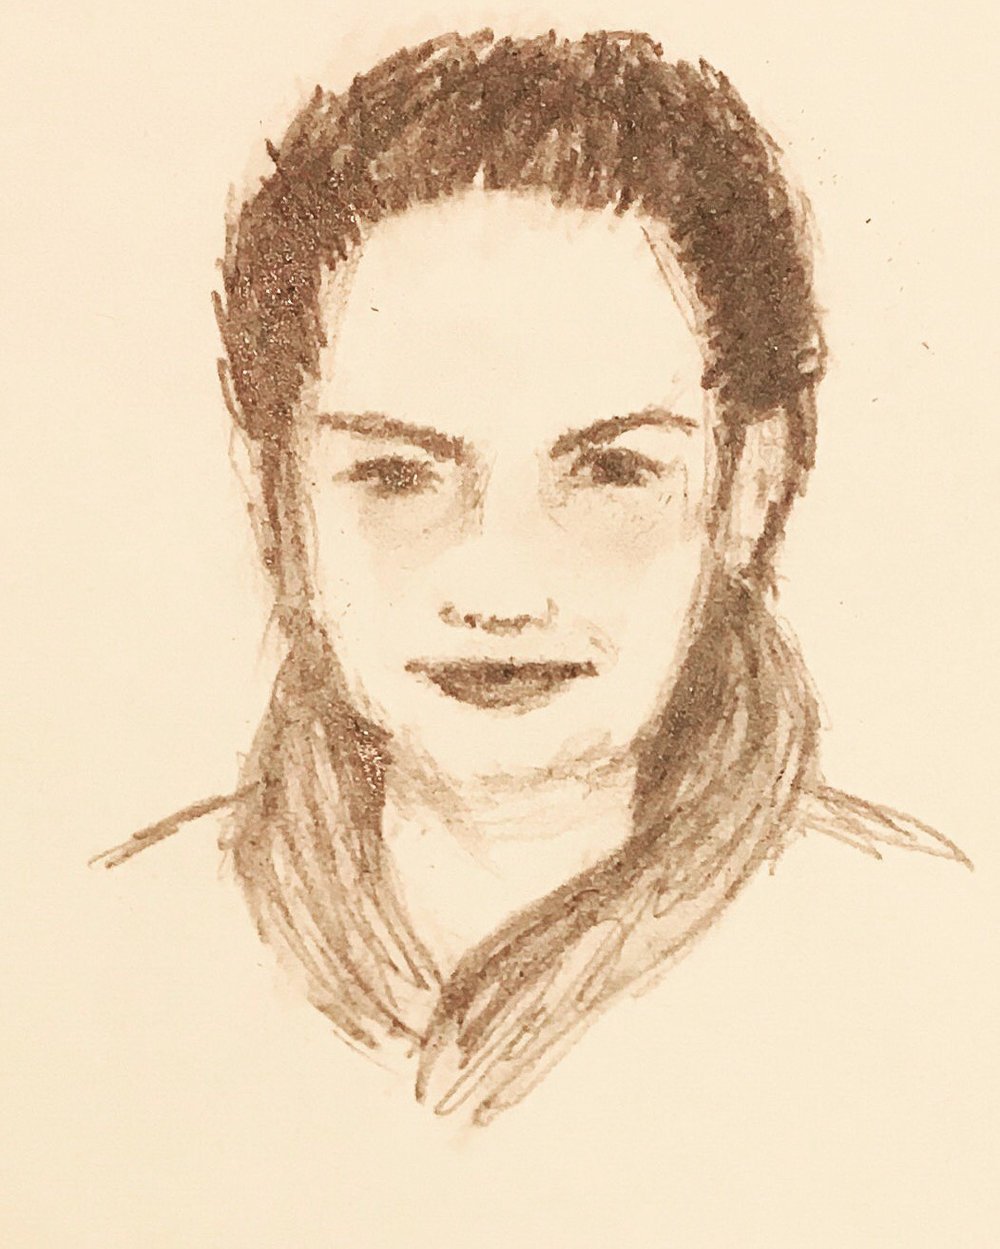 Sketch 55 pencil on paper